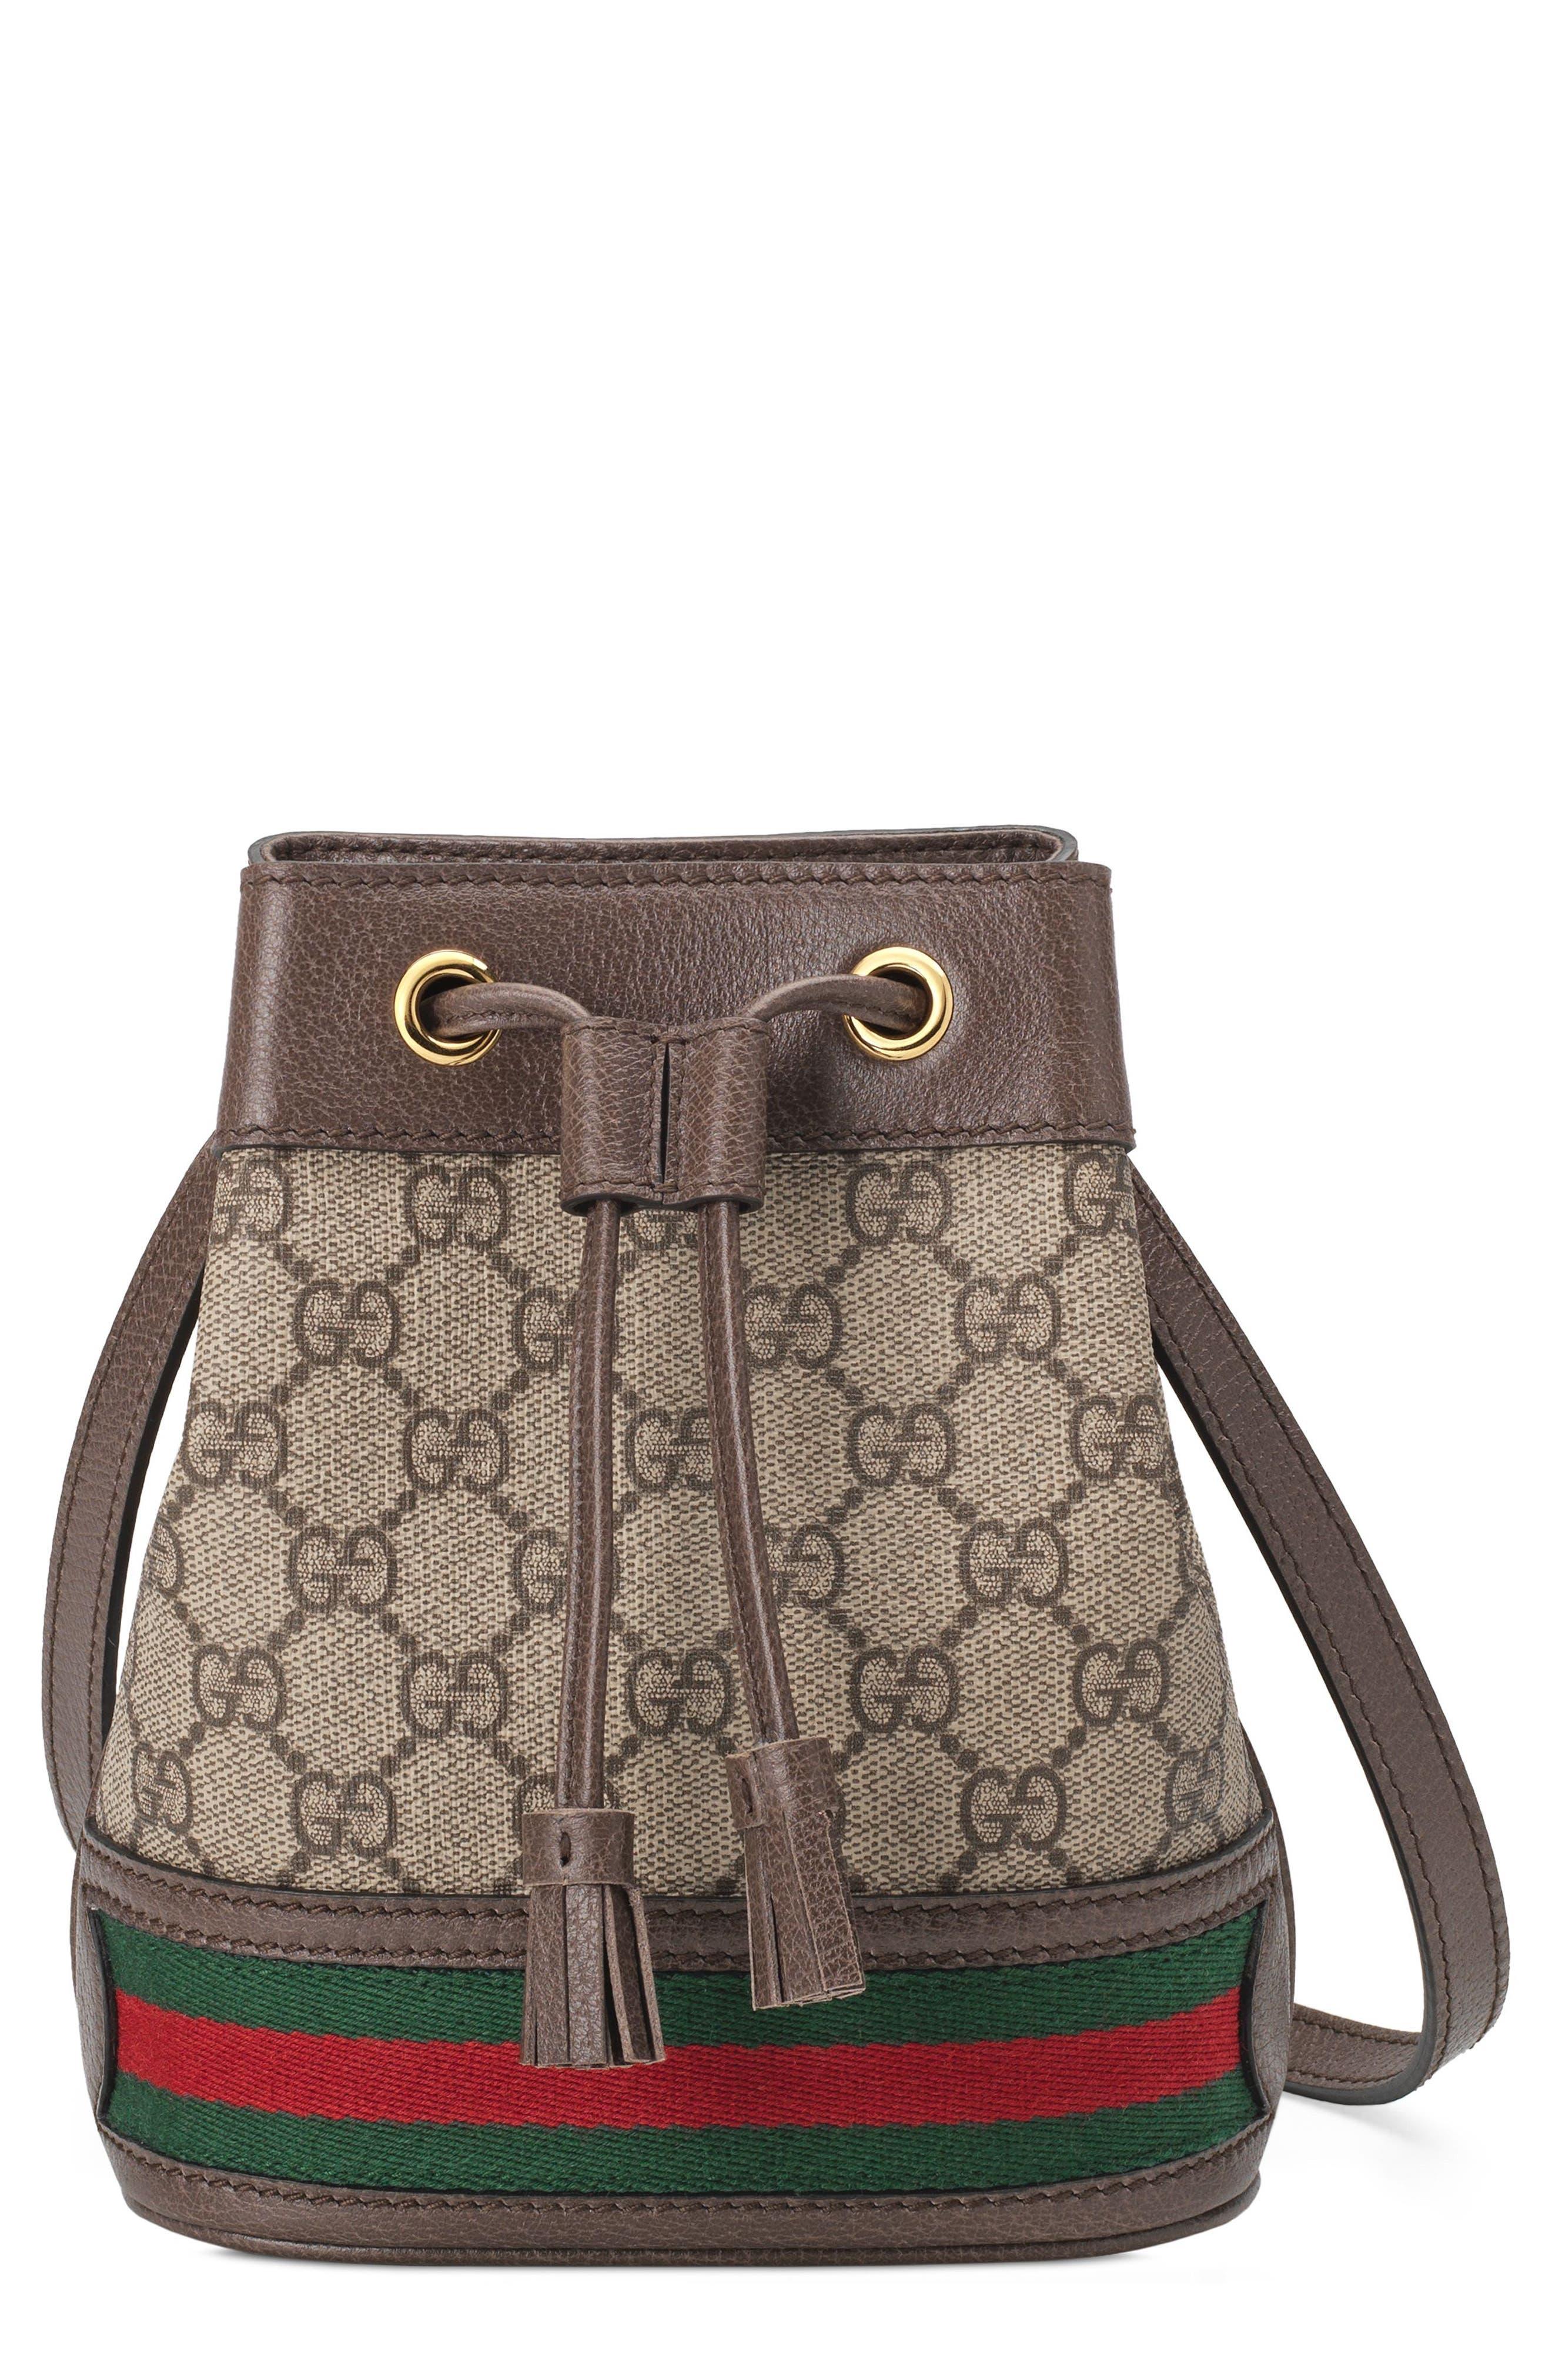 Mini Ophidia GG Supreme Bucket Bag,                             Main thumbnail 1, color,                             BEIGE EBONY/ NEW ACERO